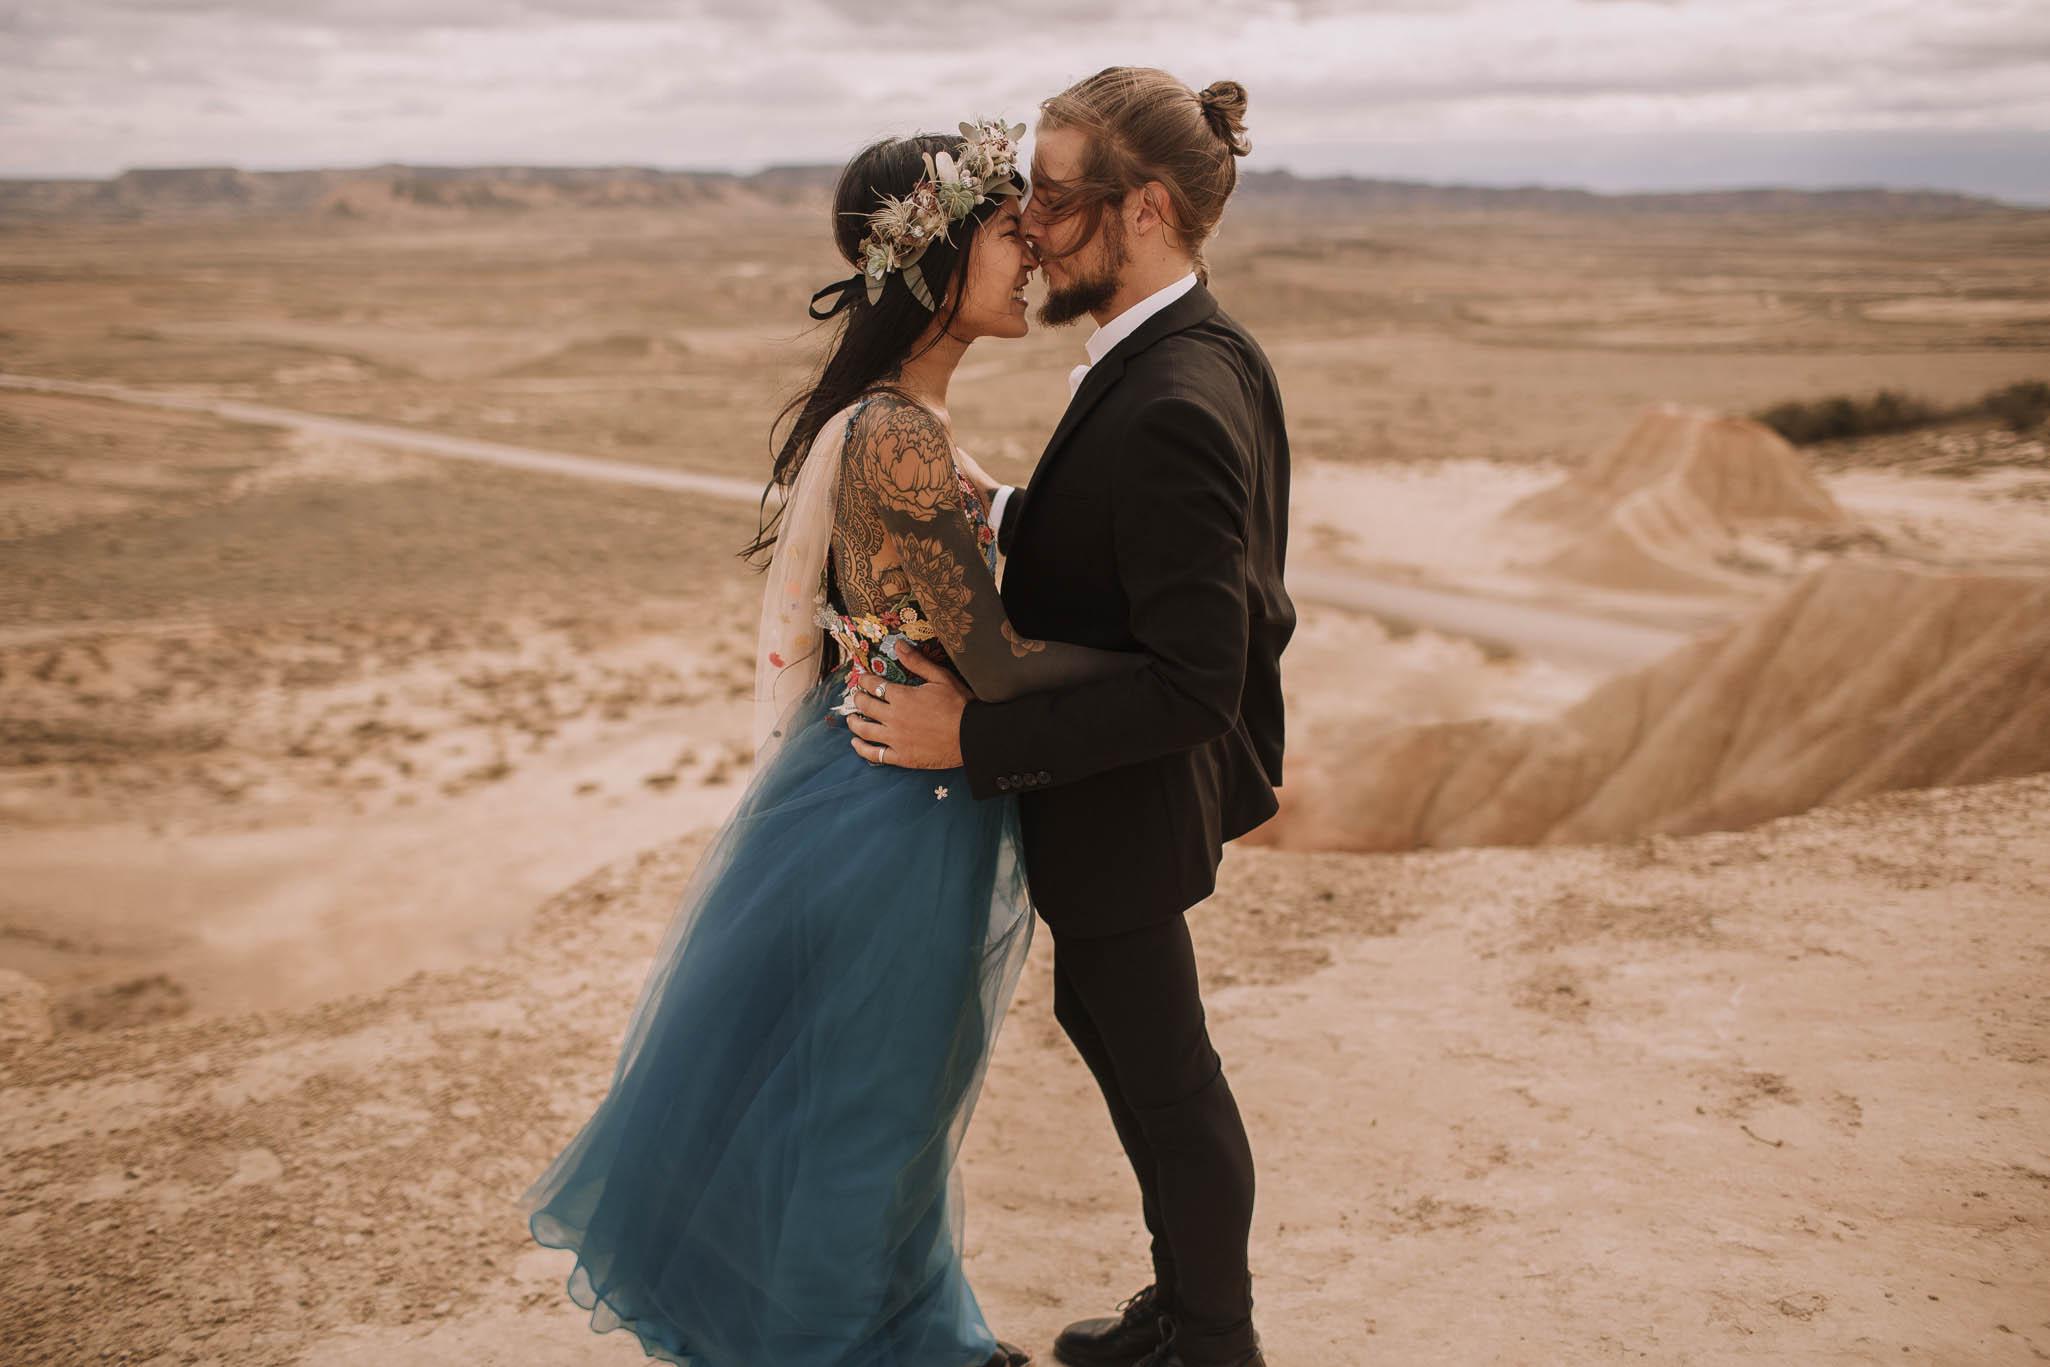 Spain-wedding-photographer-bardenas-reales-jeremy-boyer-photographe-mariage-bordeaux-floral-wedding-dress-robe-107.jpg